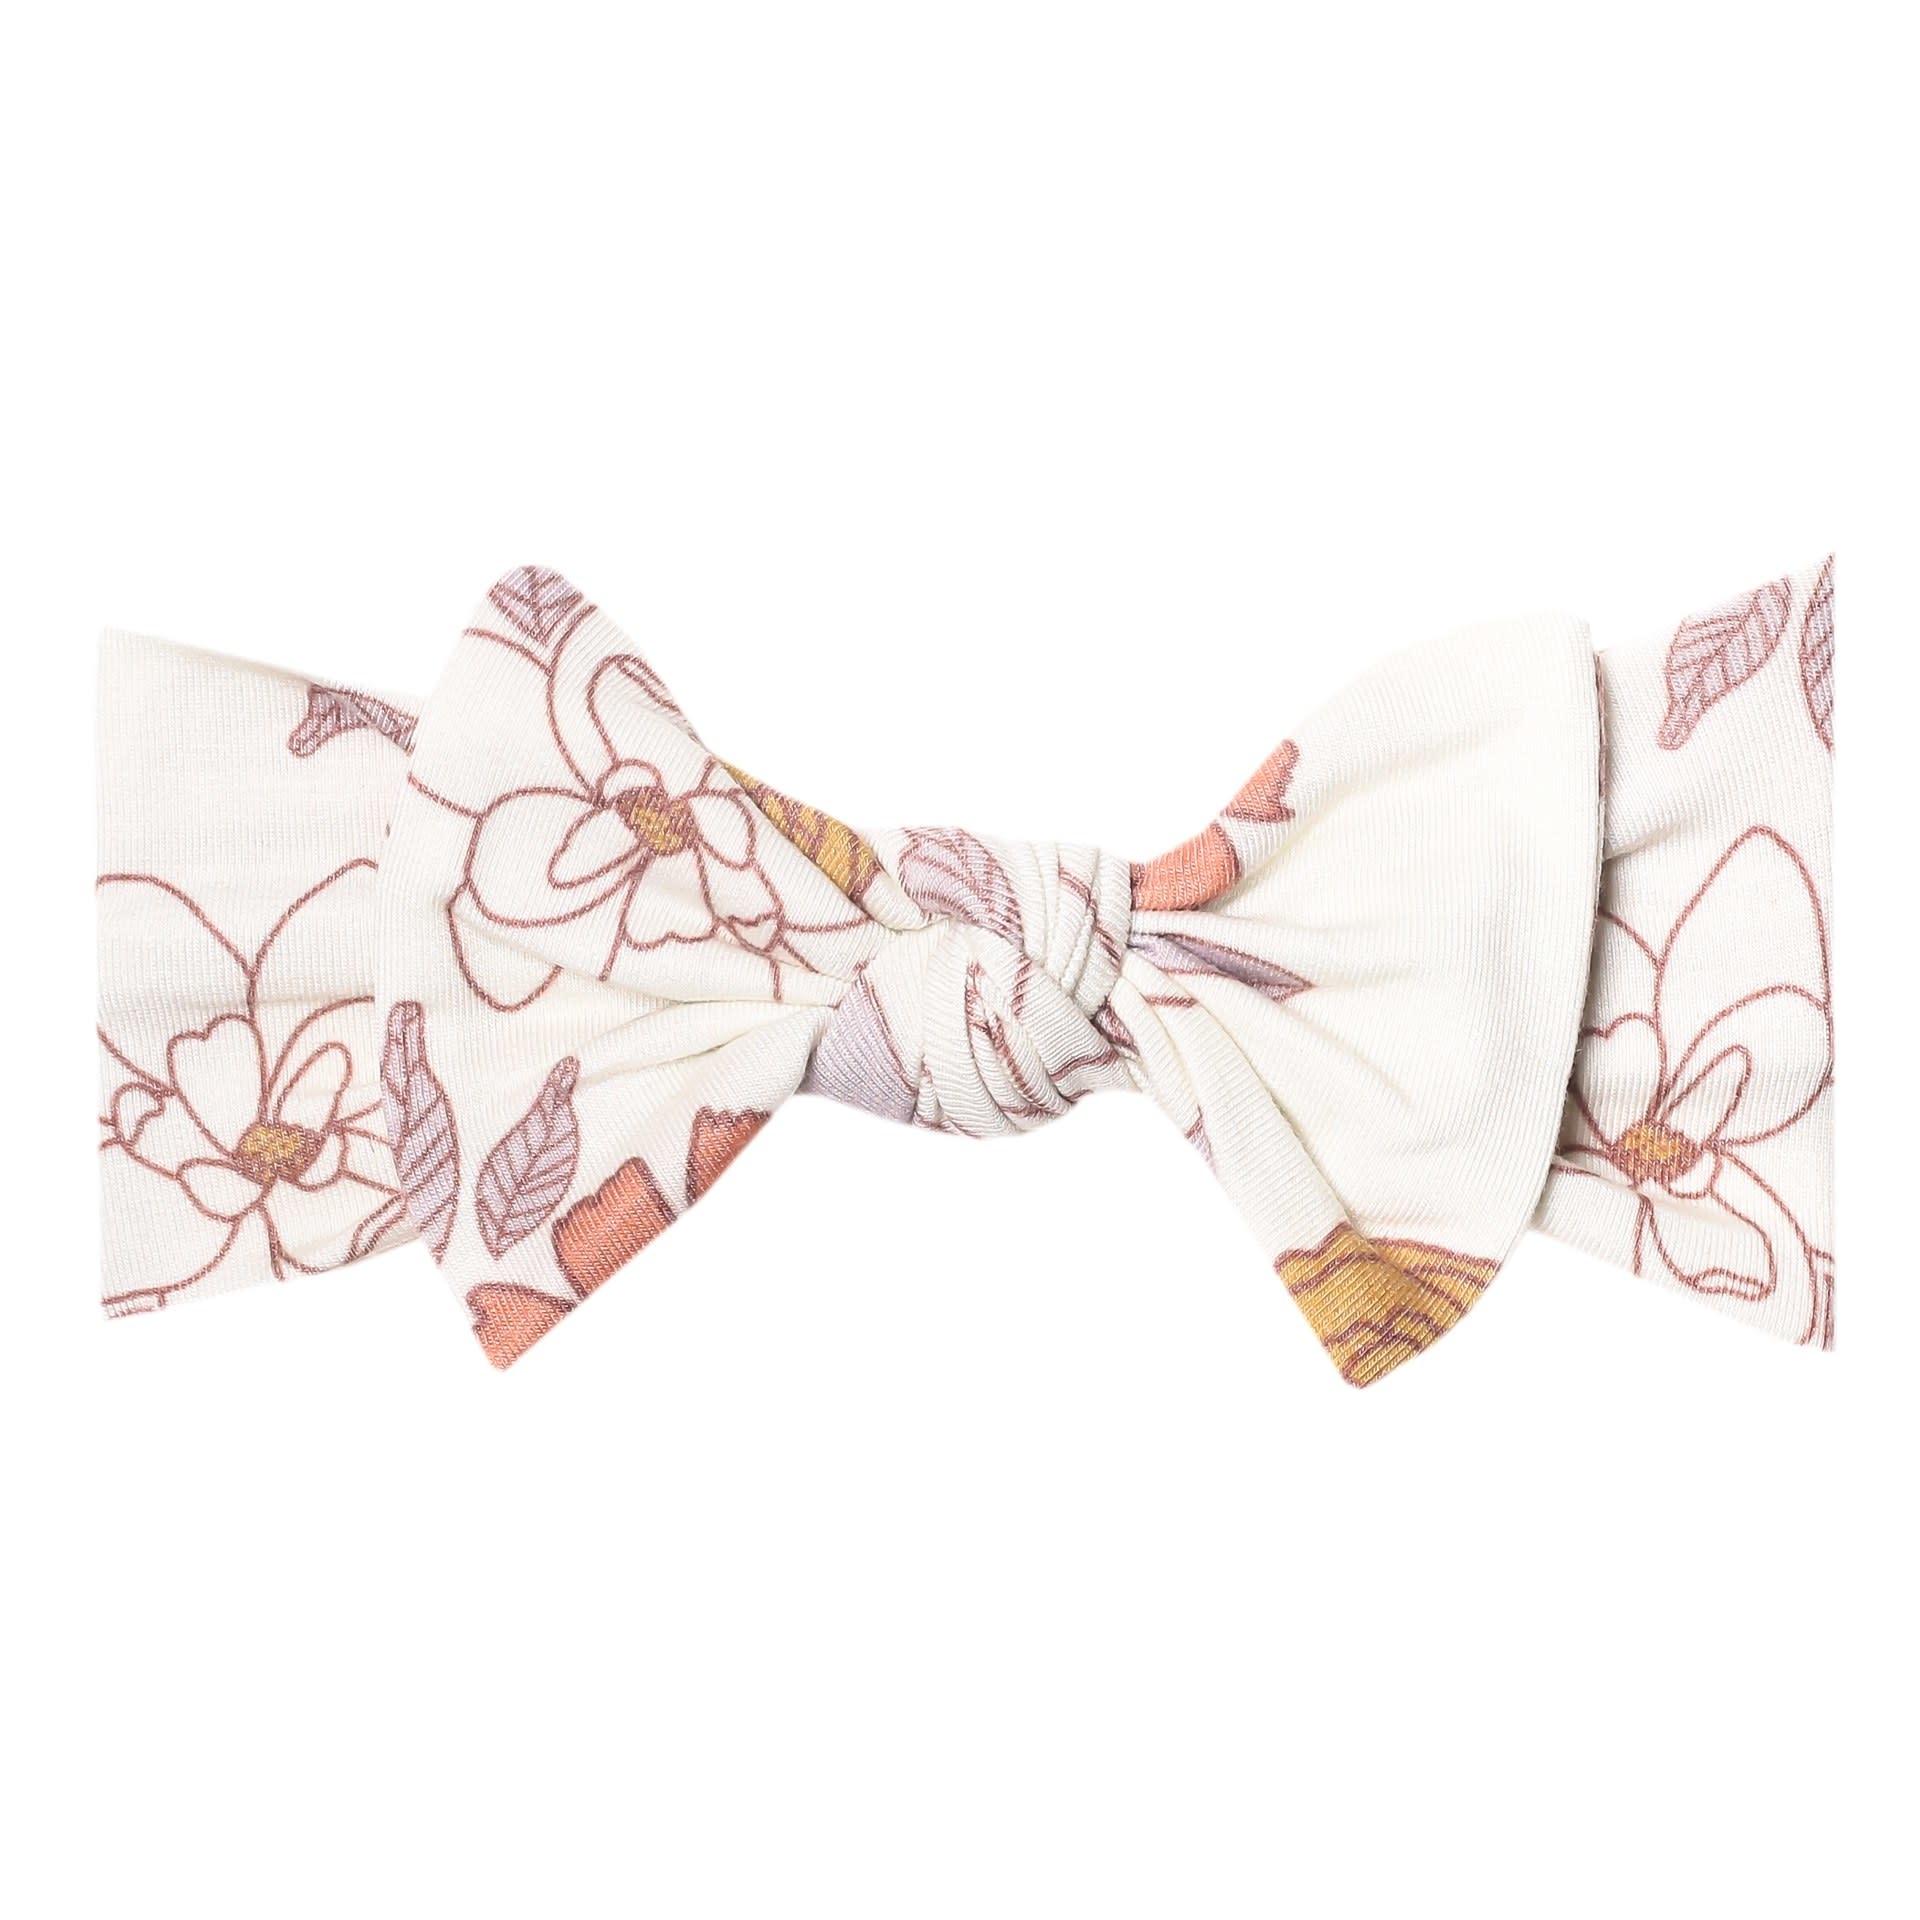 Copper Pearl Knit Headband - Ferra